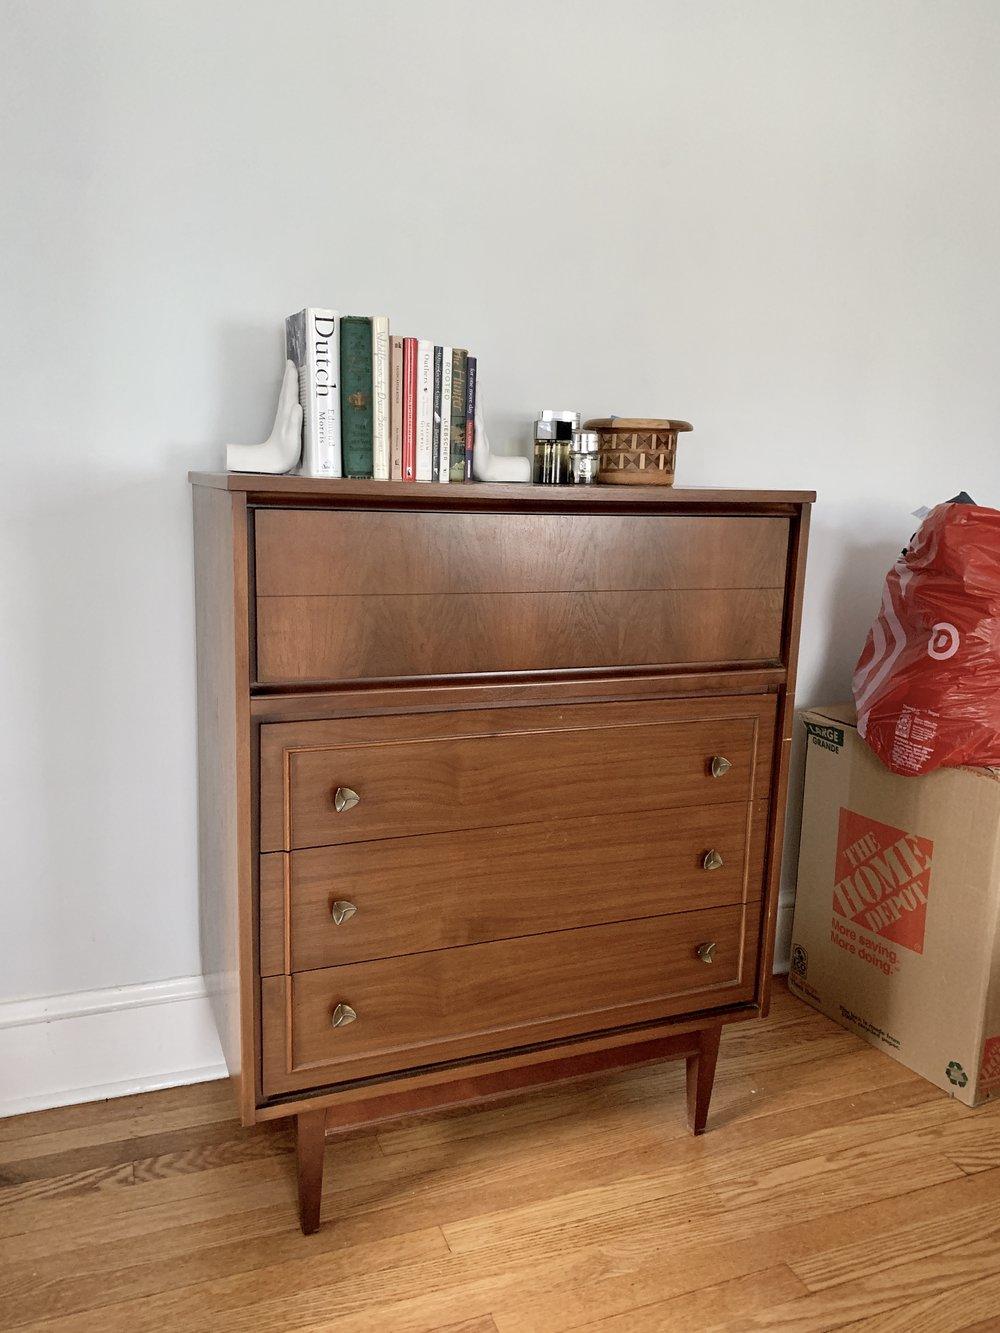 vintage tall dresser.jpg